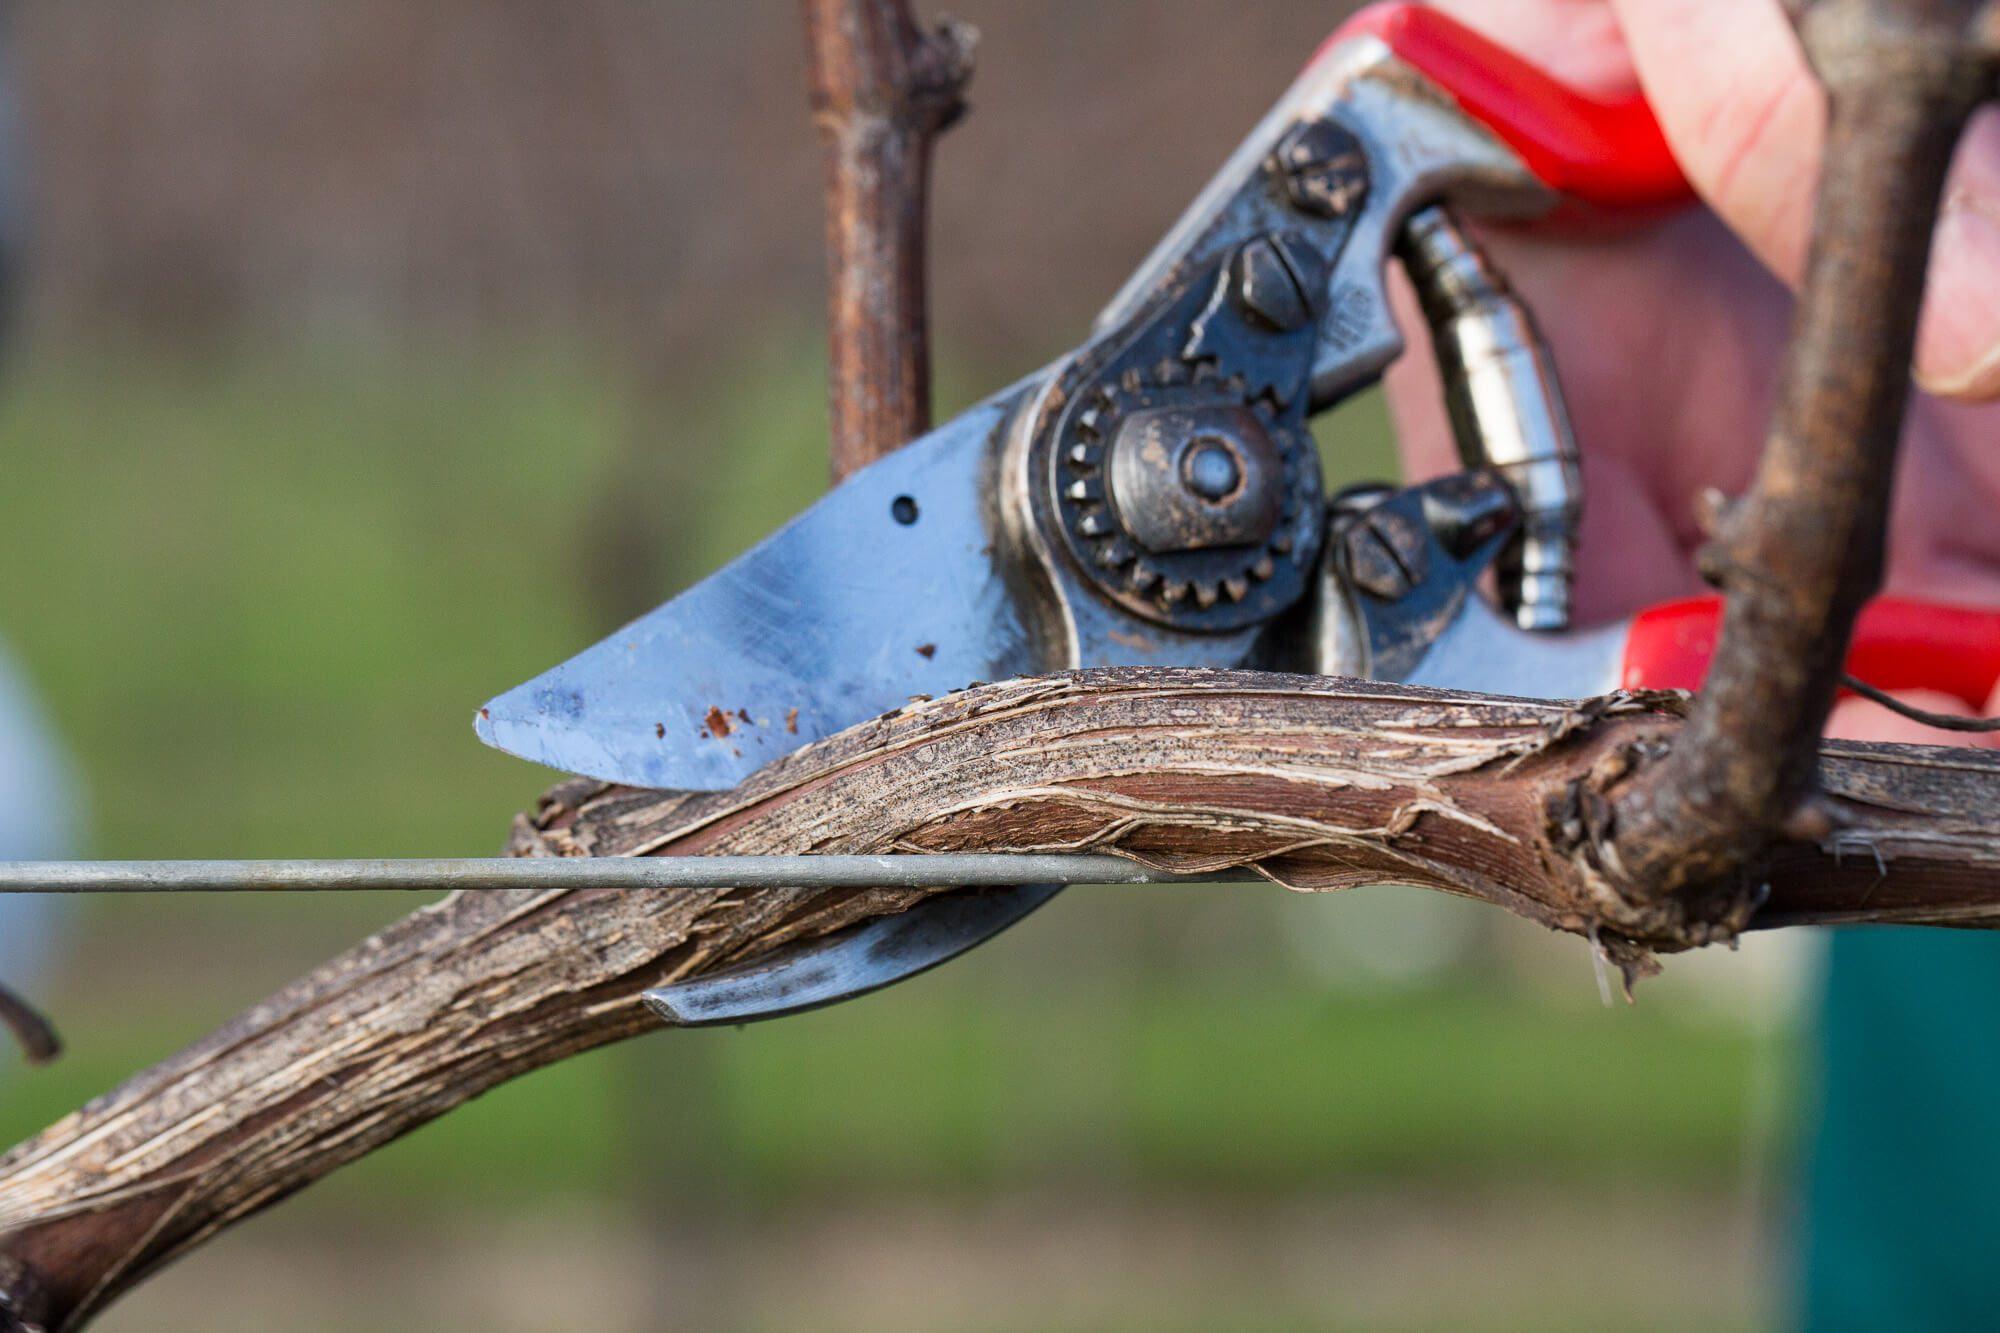 Pruning Close Up